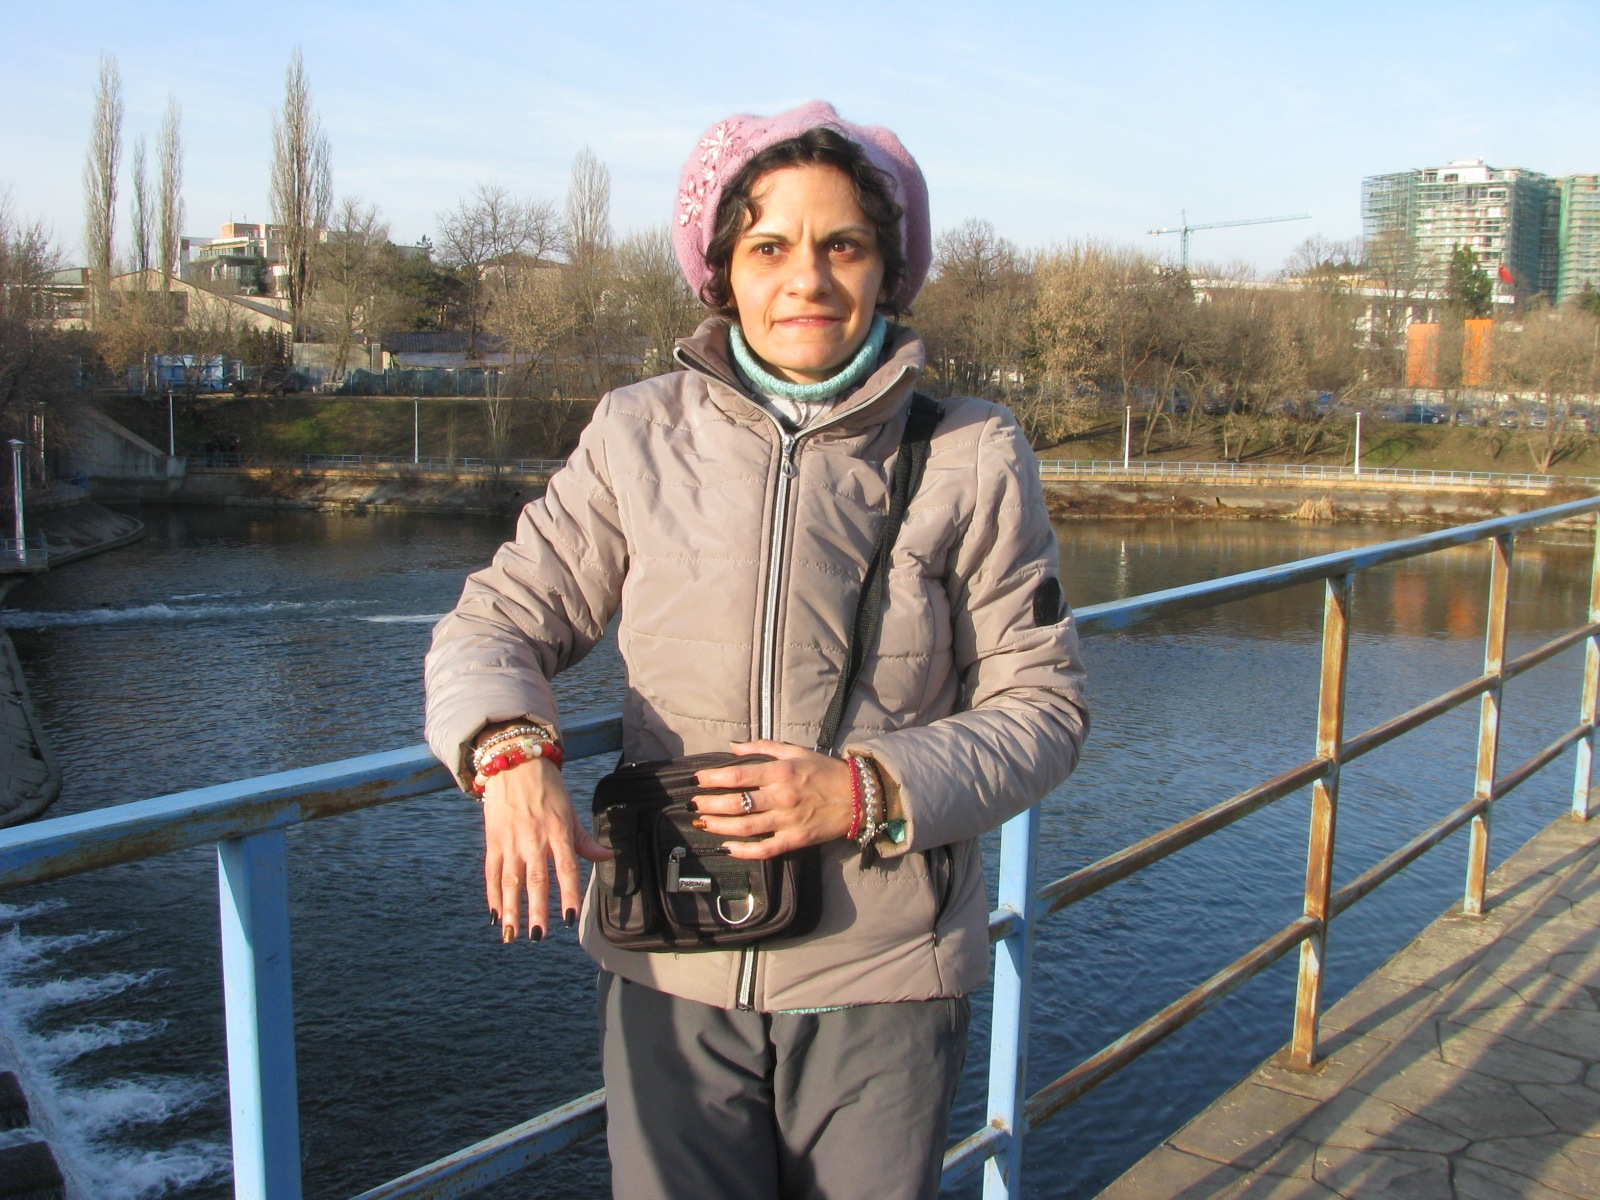 At Herastrau park in Bucharest, Romania, 26.02/ 2017 by Elena Maria